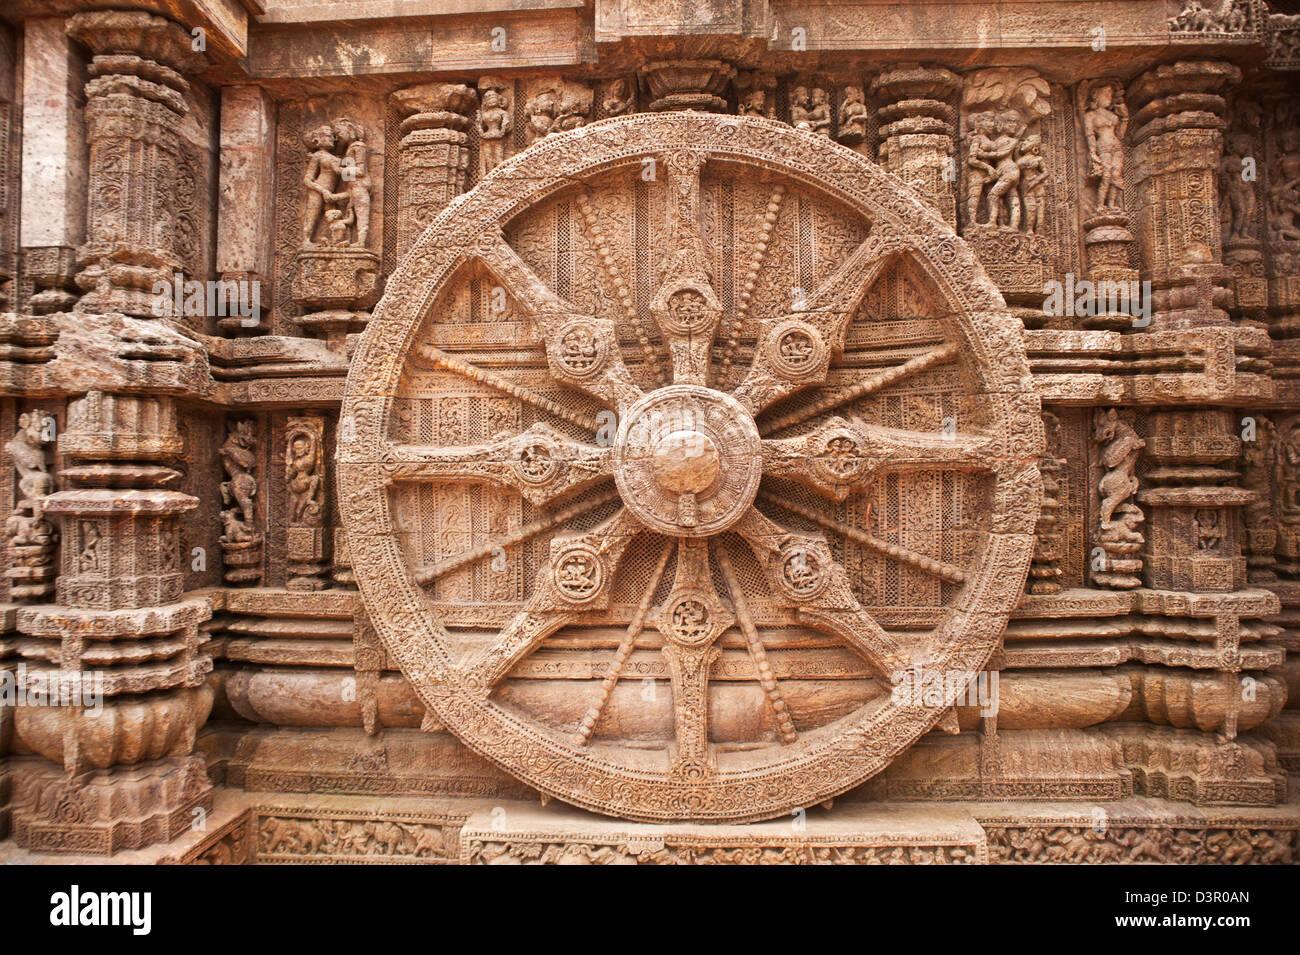 Indian Culture Wallpaper Hd Carving Details Of A Wheel At A Temple Konark Sun Temple